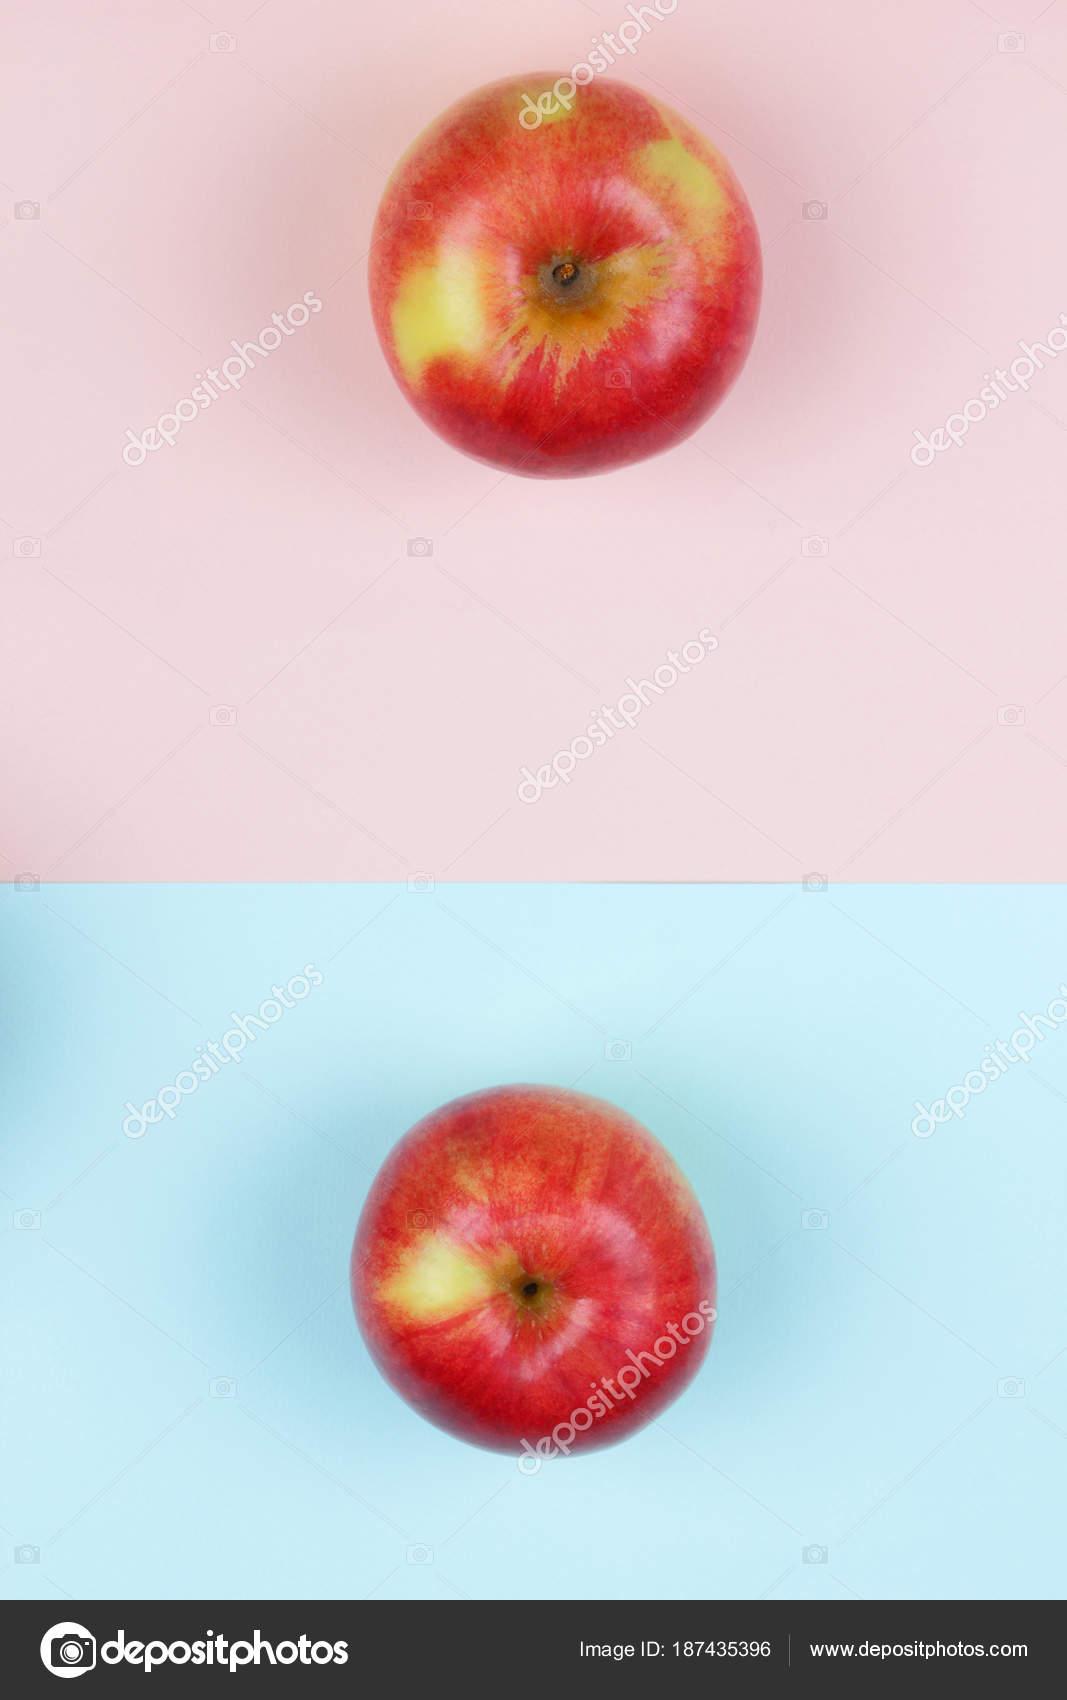 Apple Arte Schiocco Frutta Mela Rossa Una Priorità Bassa Blu Foto